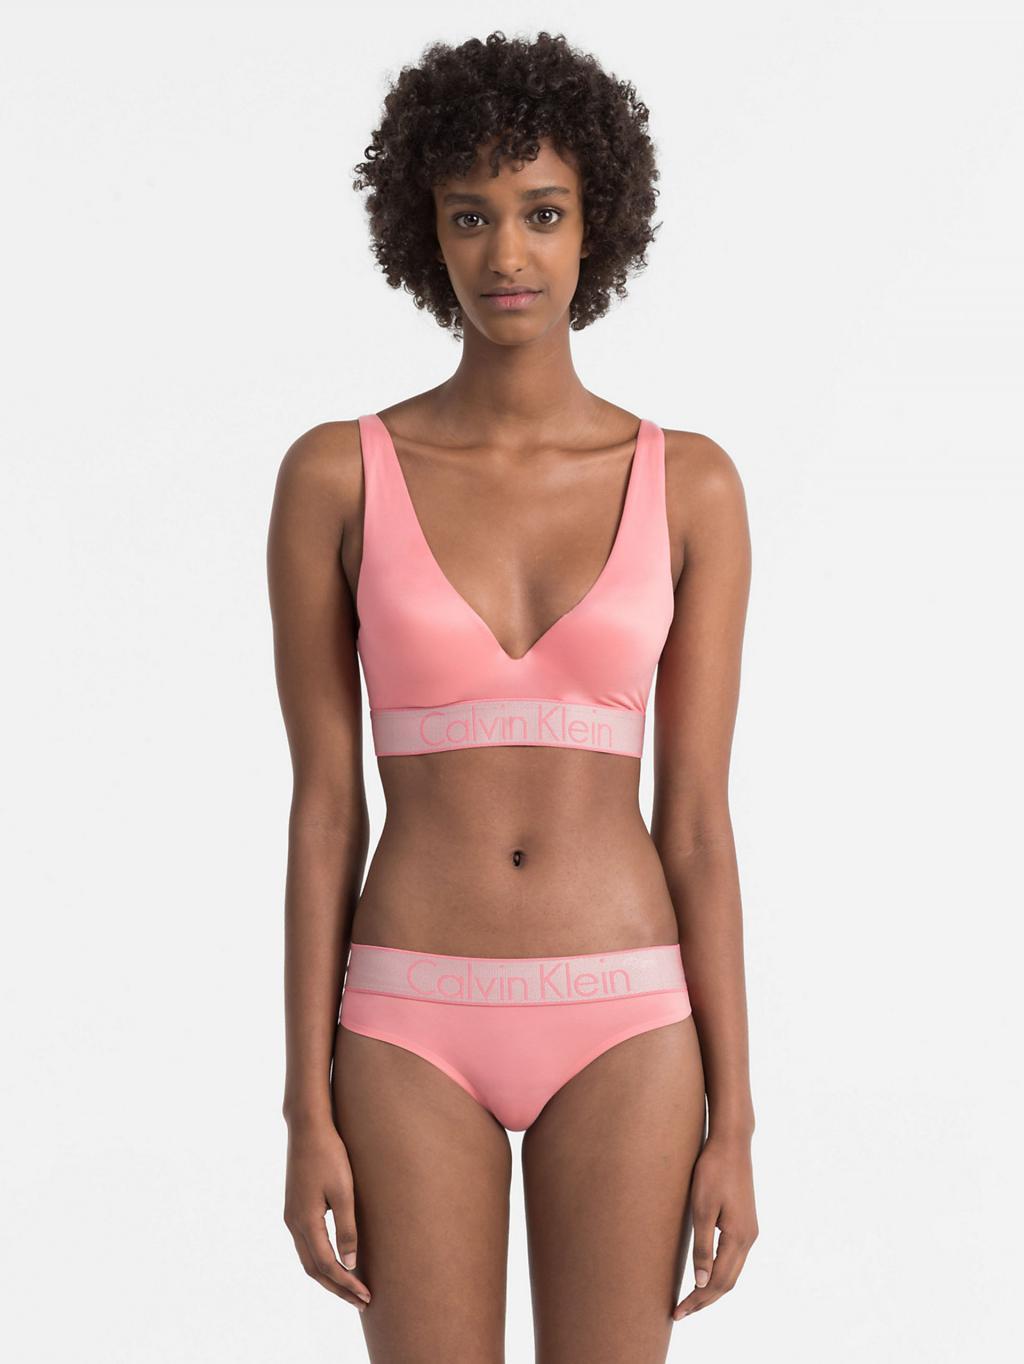 ae2b57ecd QF4052 - podprsenka Calvin Klein :: dámské spodní prádlo ...